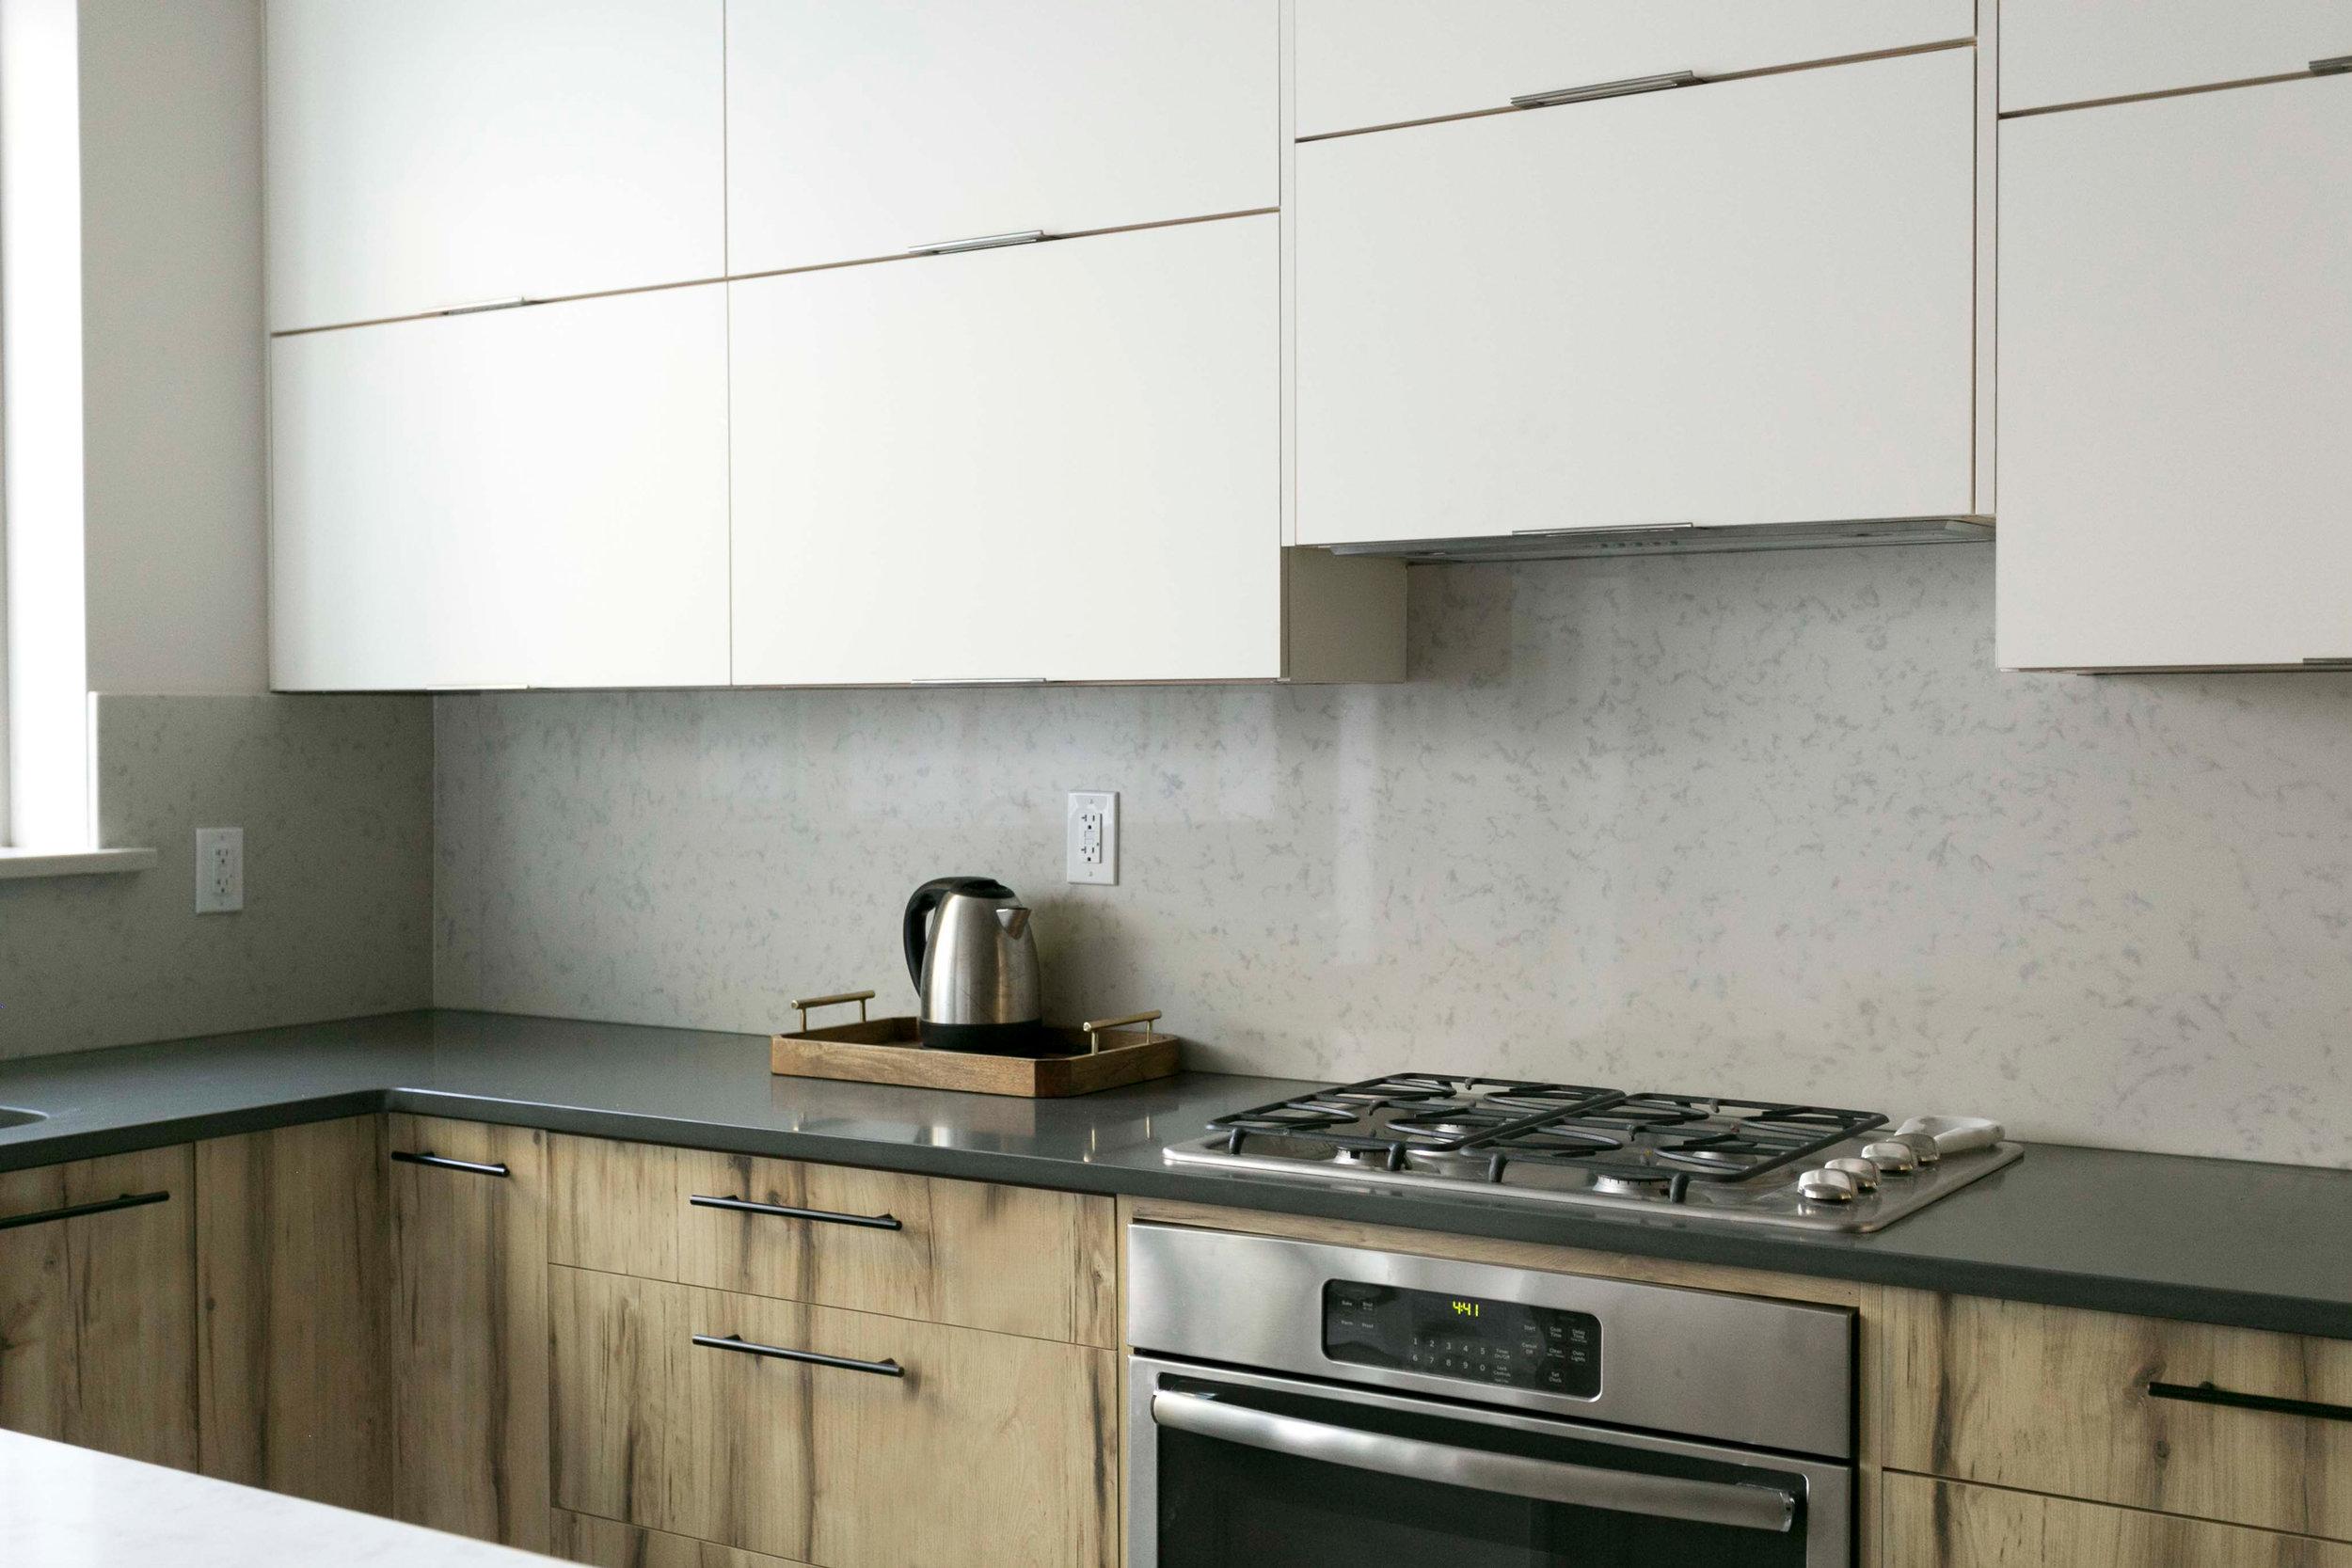 living-room-ideas-kitchen-design-nyc.jpg